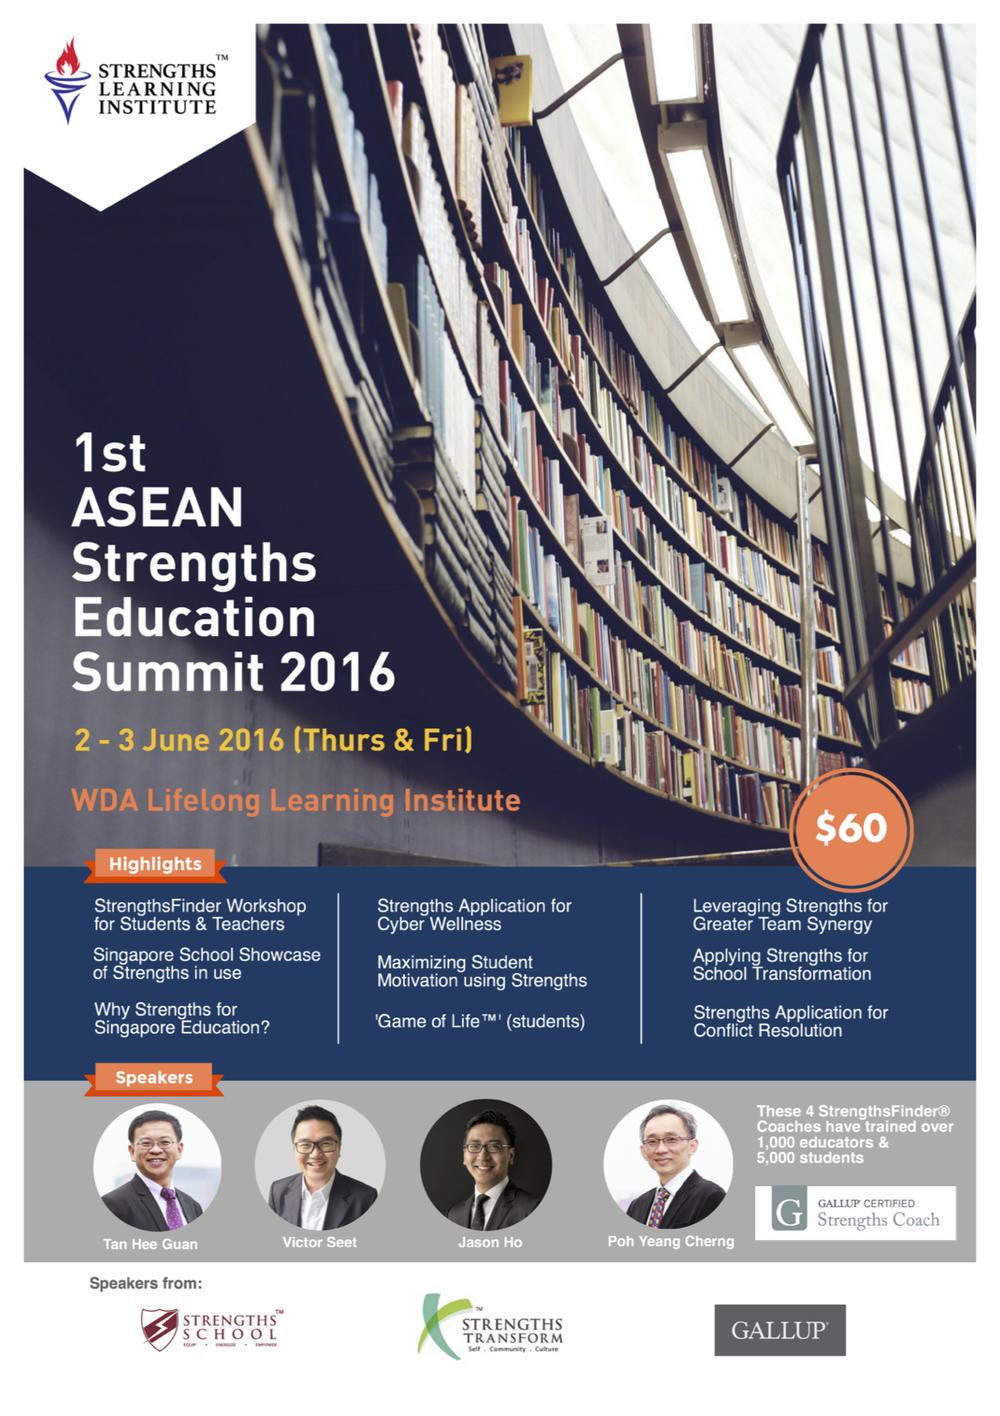 ASEAN Strengths Education Summit 2016 Jason Ho Victor Seet (StrengthsFinder Singapore)